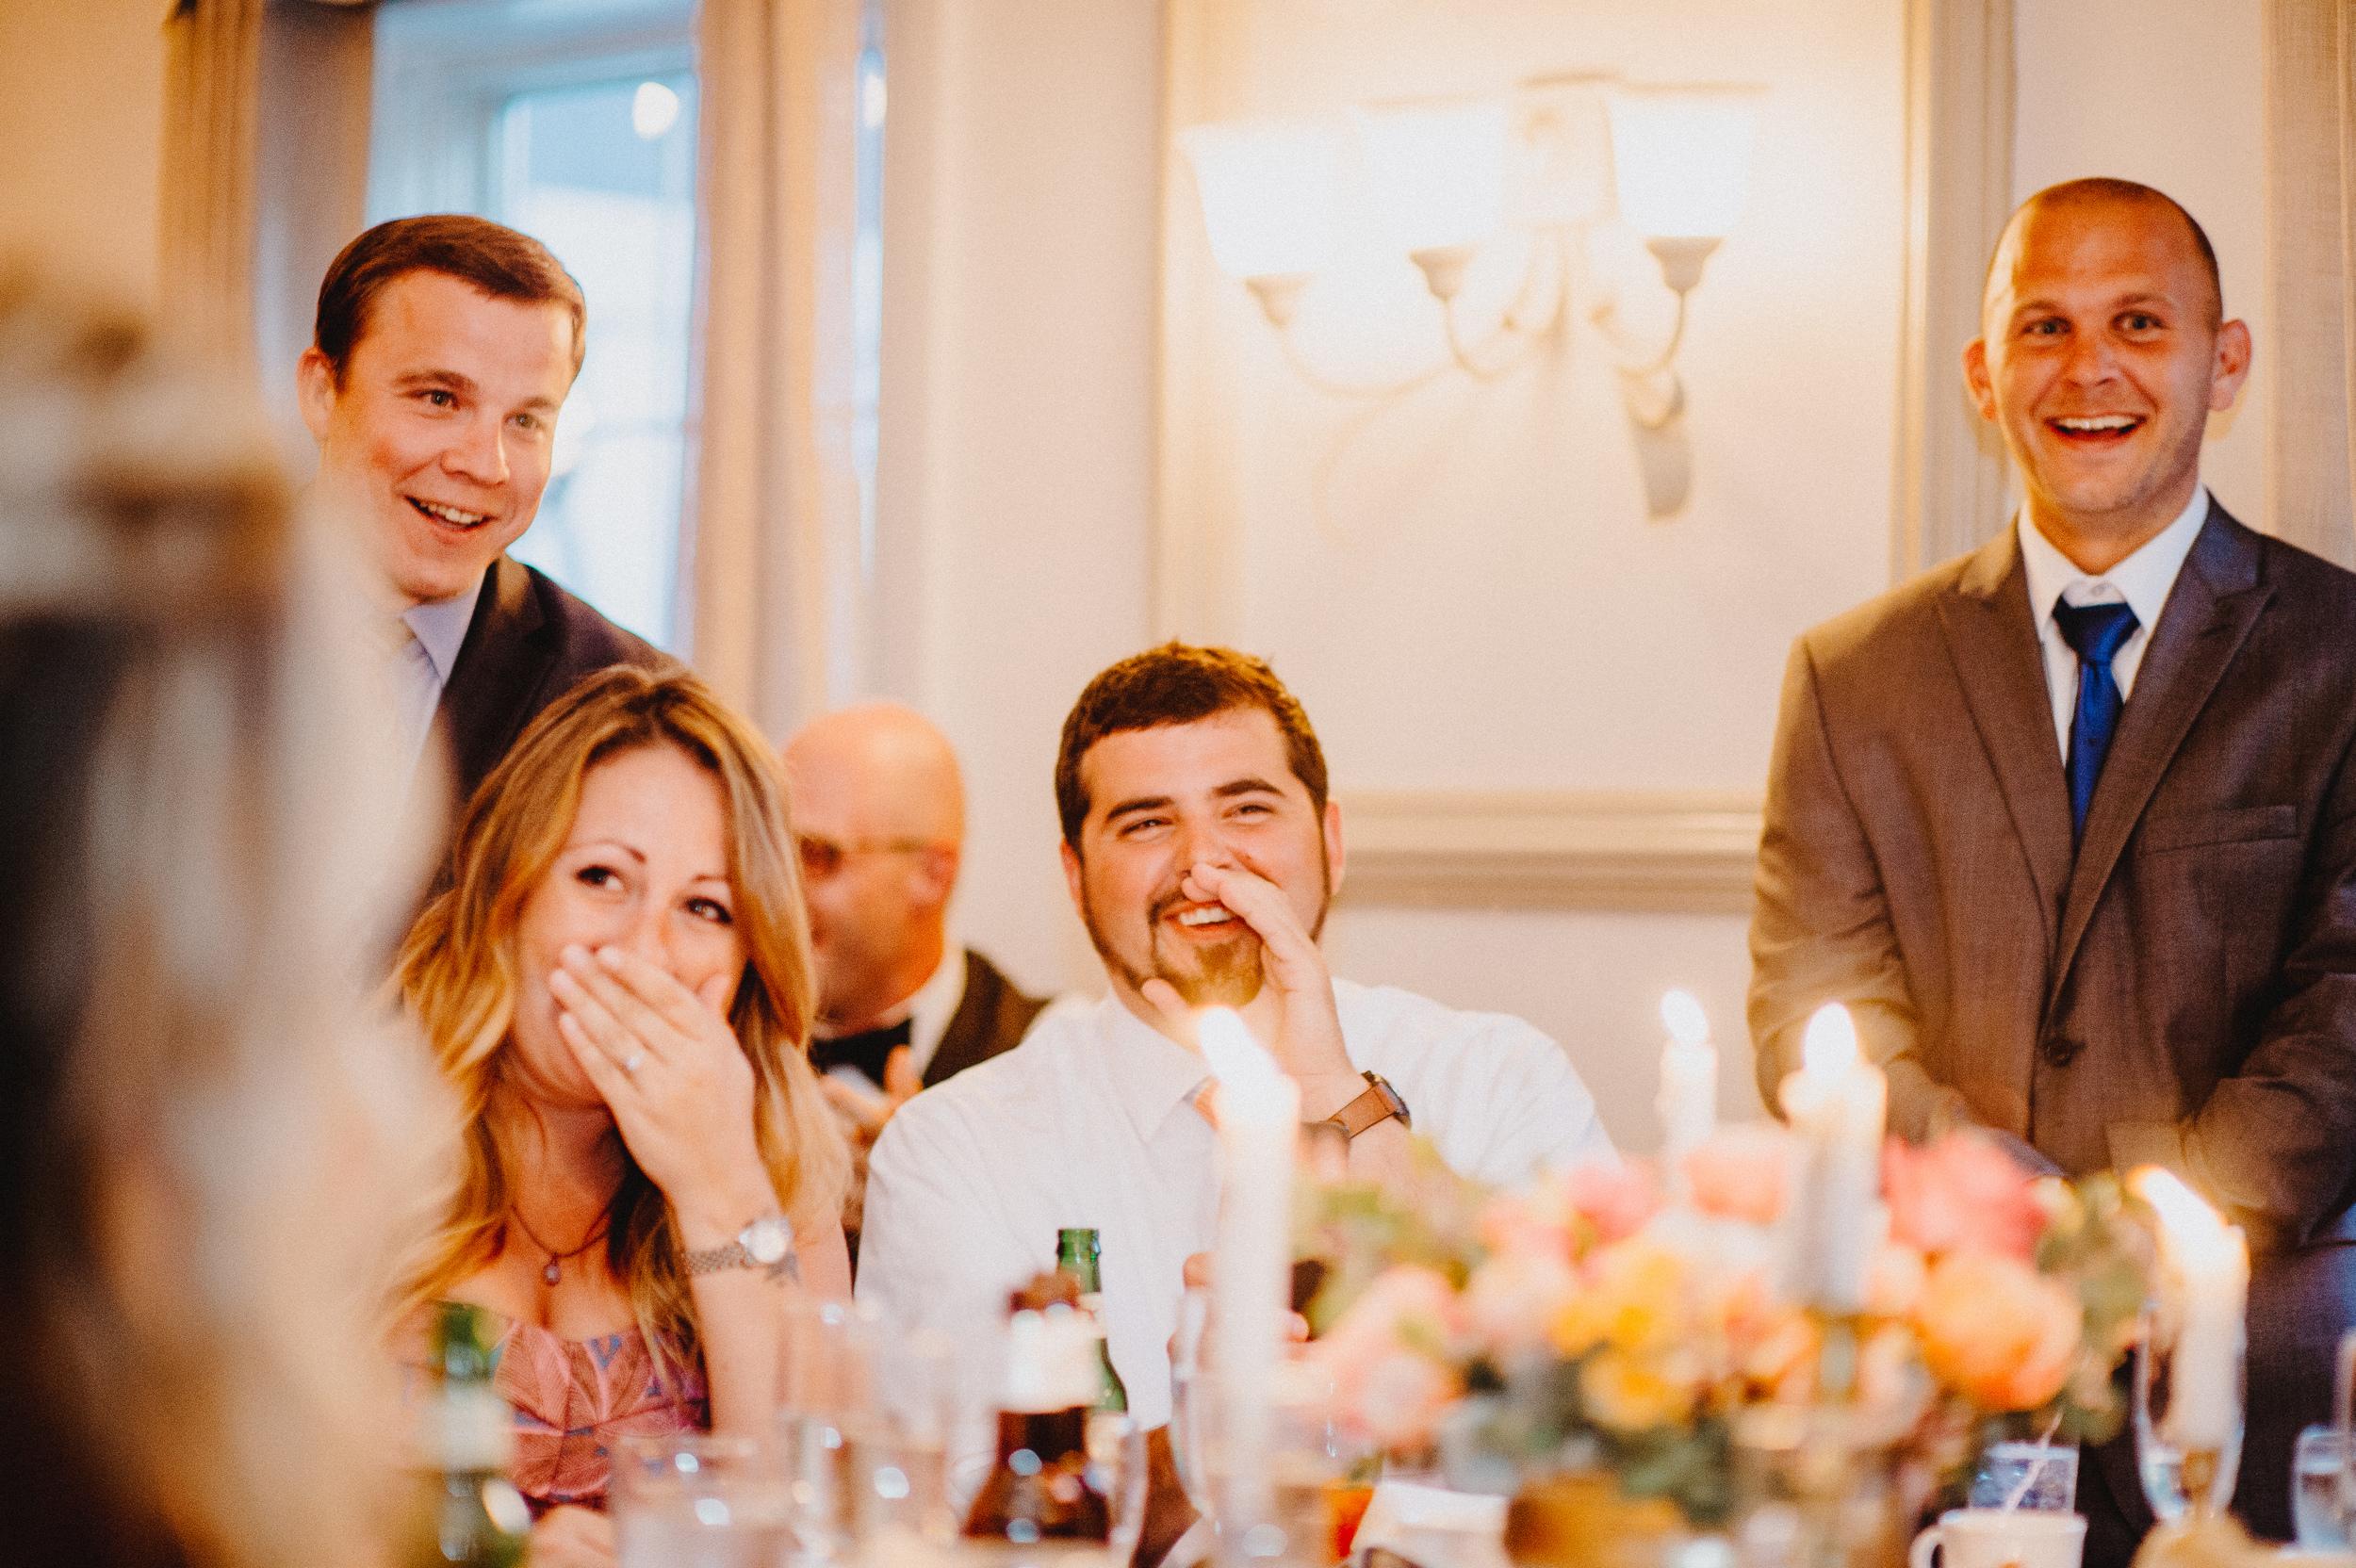 holly-hedge-estate-wedding-photographer-pat-robinson-photography-90.jpg